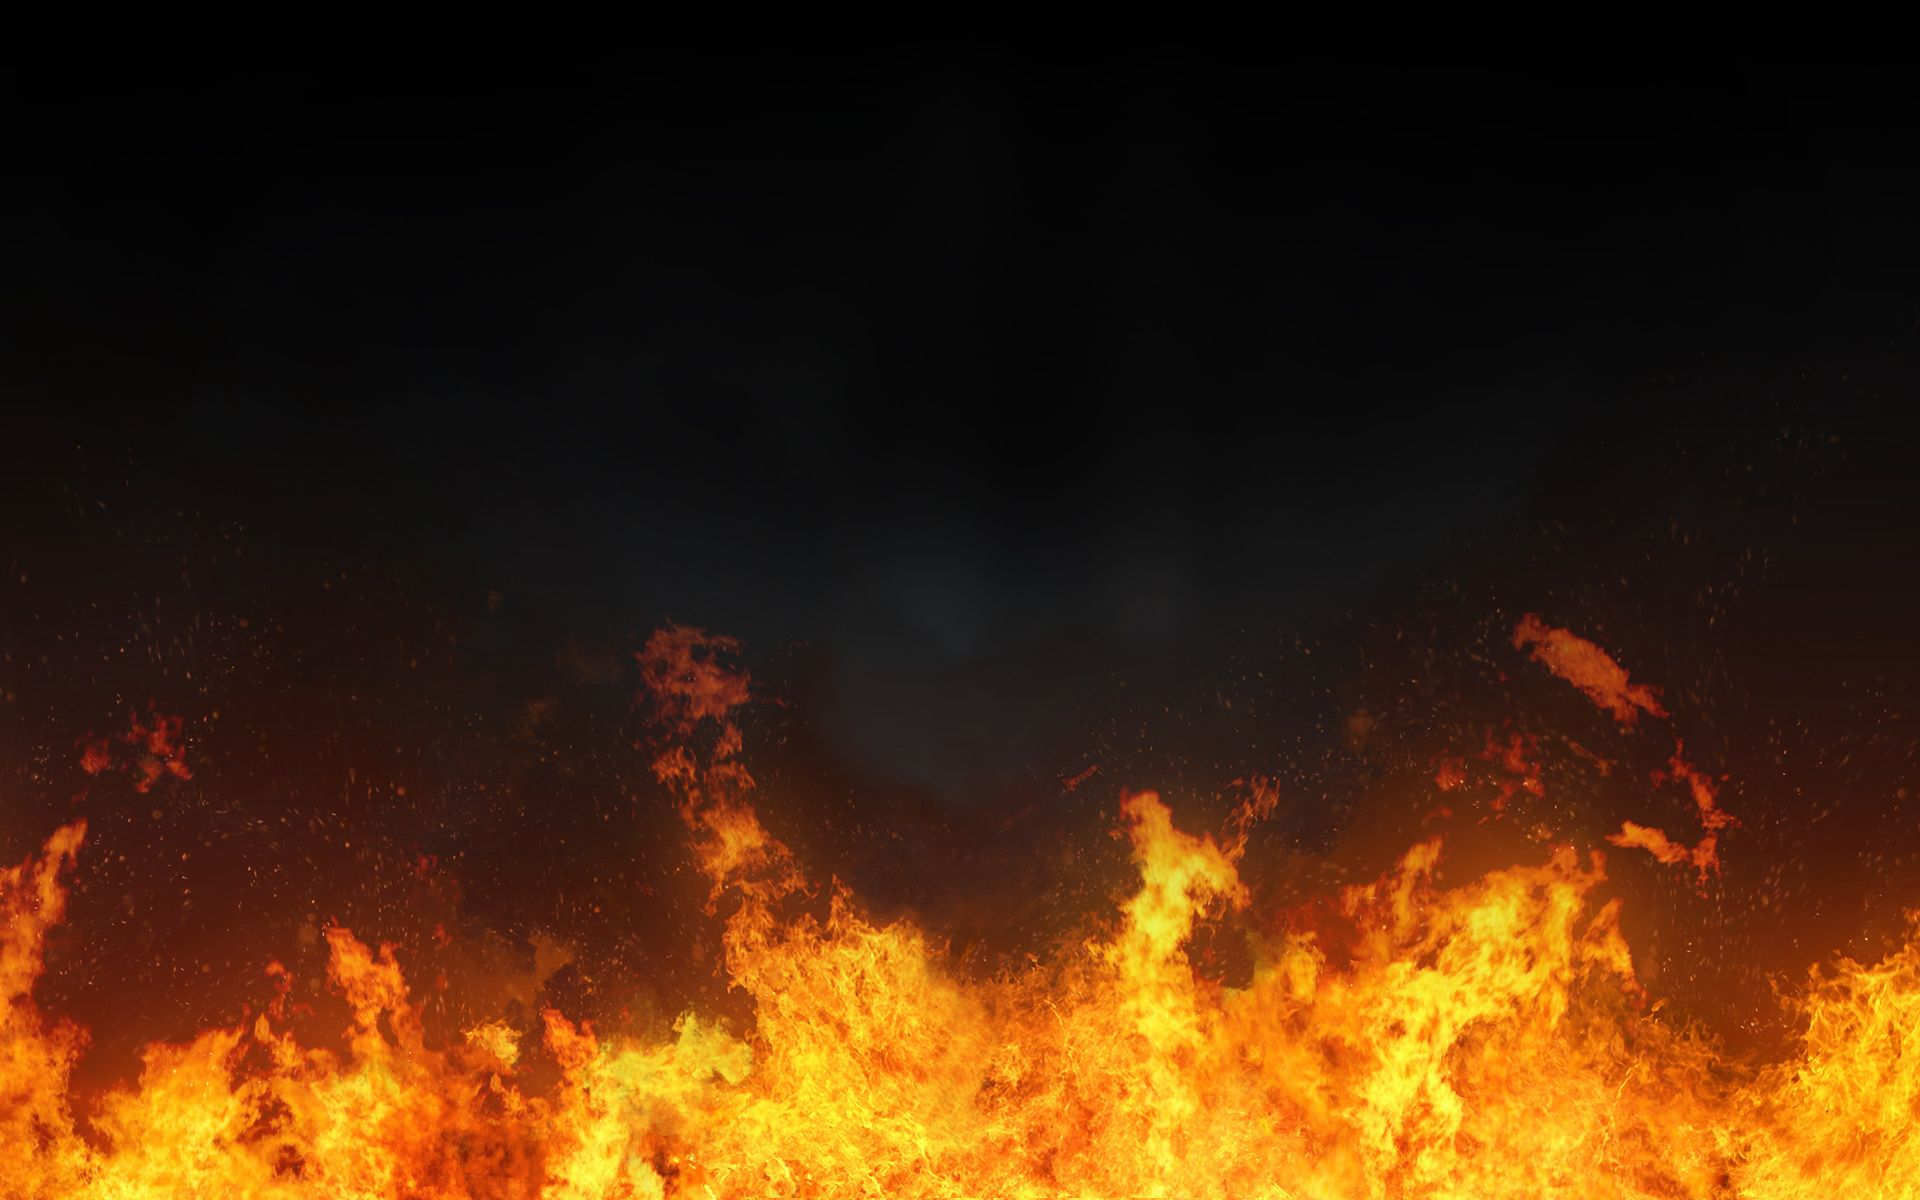 fire backgrounds for desktop